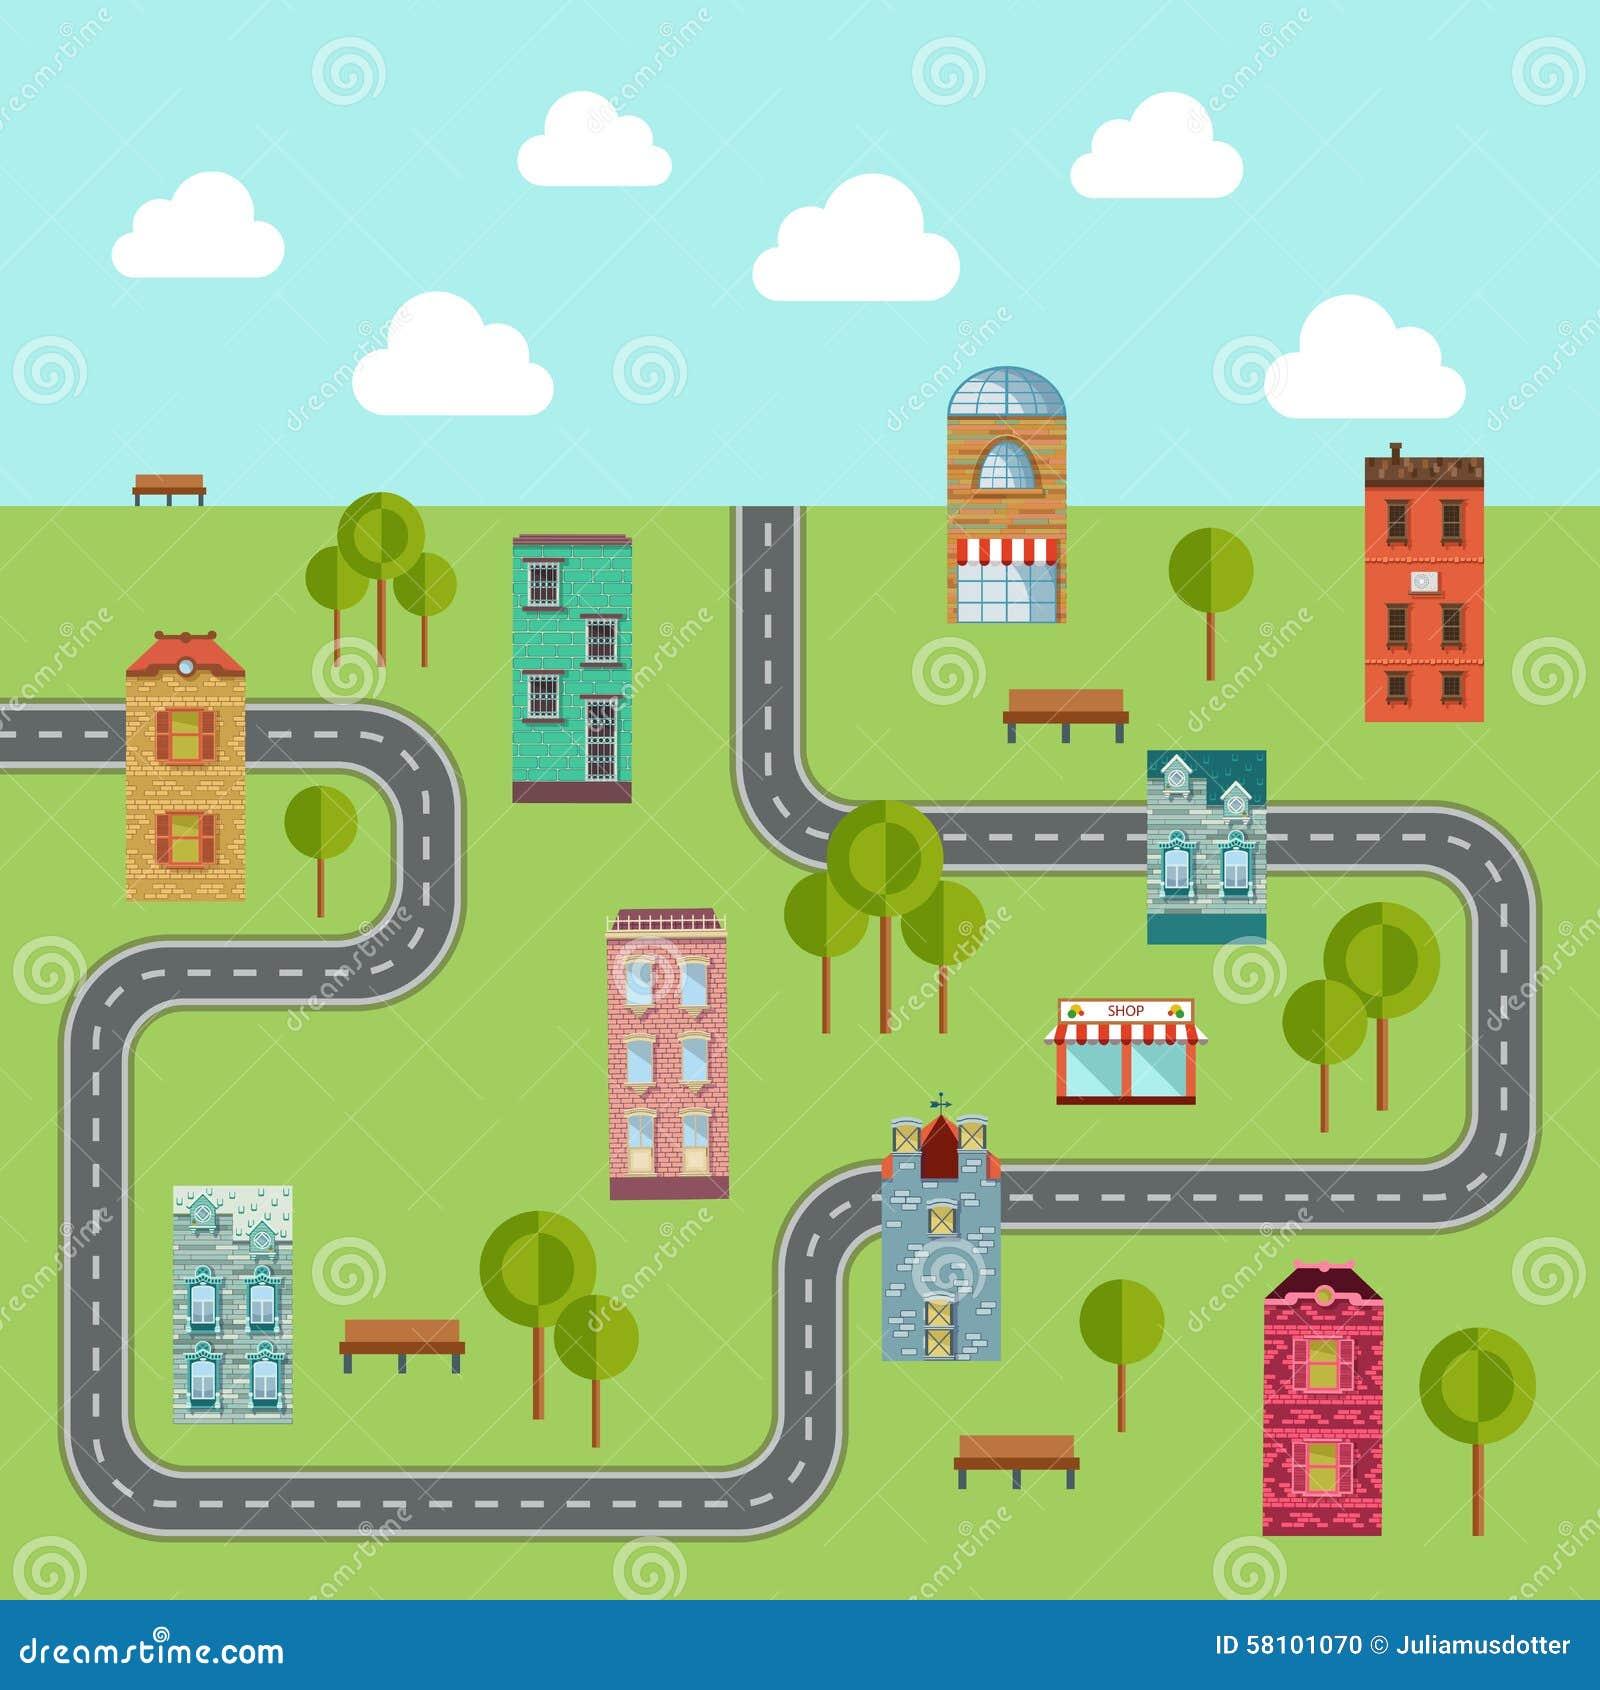 Urban Landscape Vector Illustration Of Community Stock